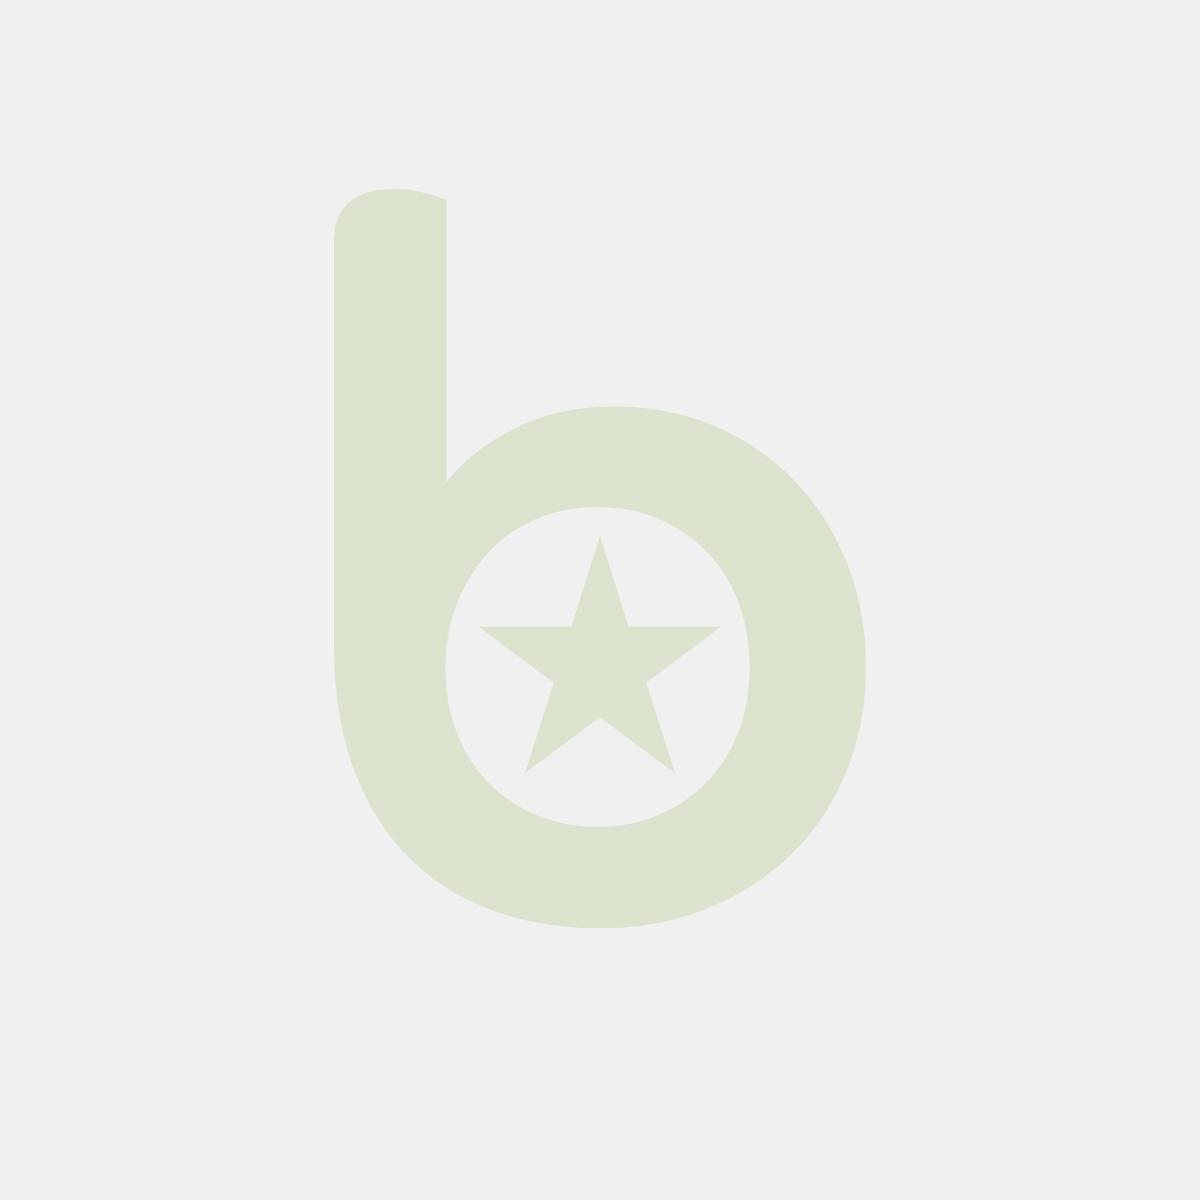 FINGERFOOD - kubek PS 120ml APOLLO 6,5x6cm transparent op. 50 sztuk